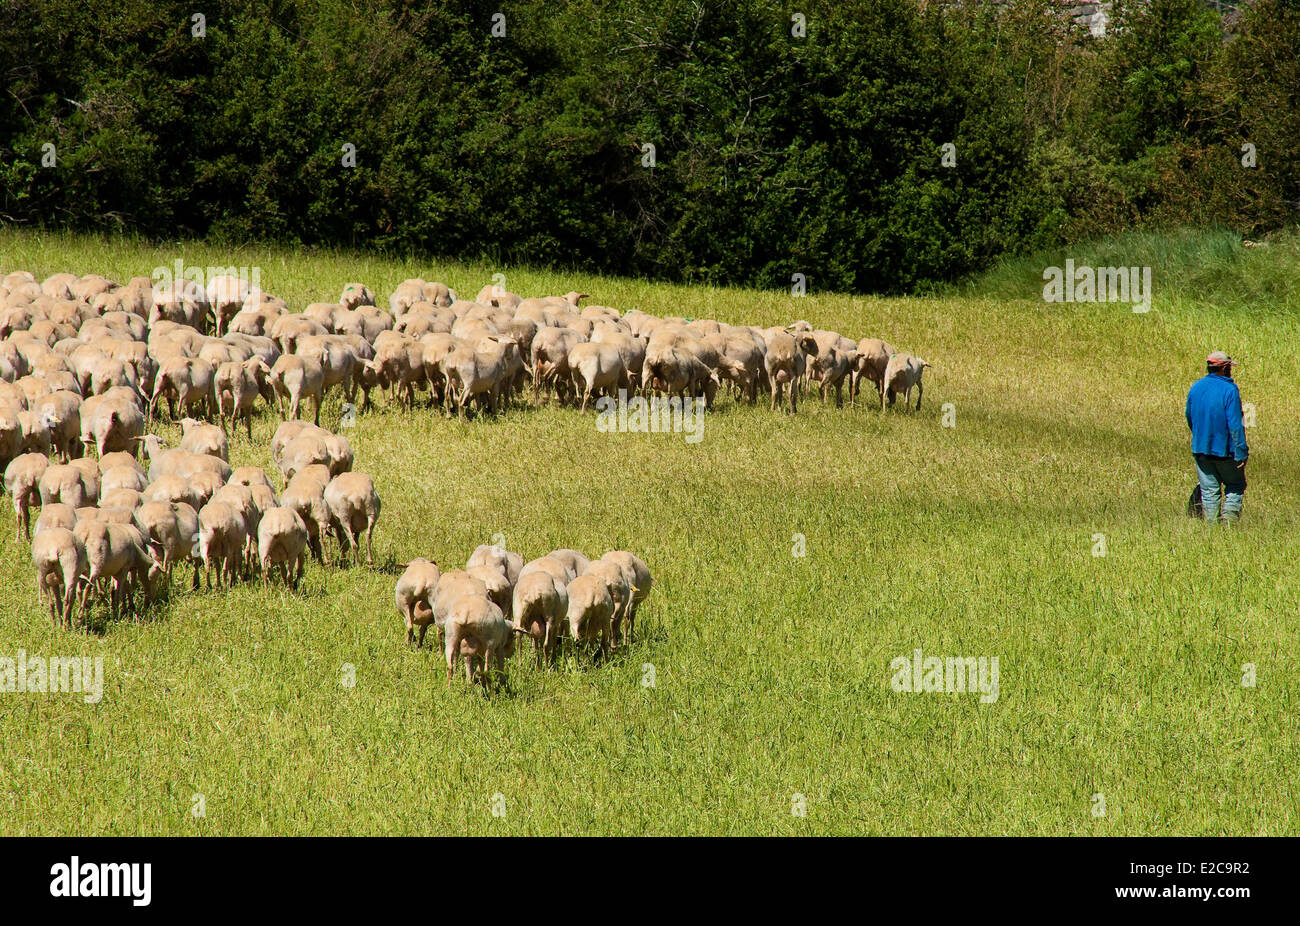 France, Aveyron, Melac shepherd and his flock - Stock Image